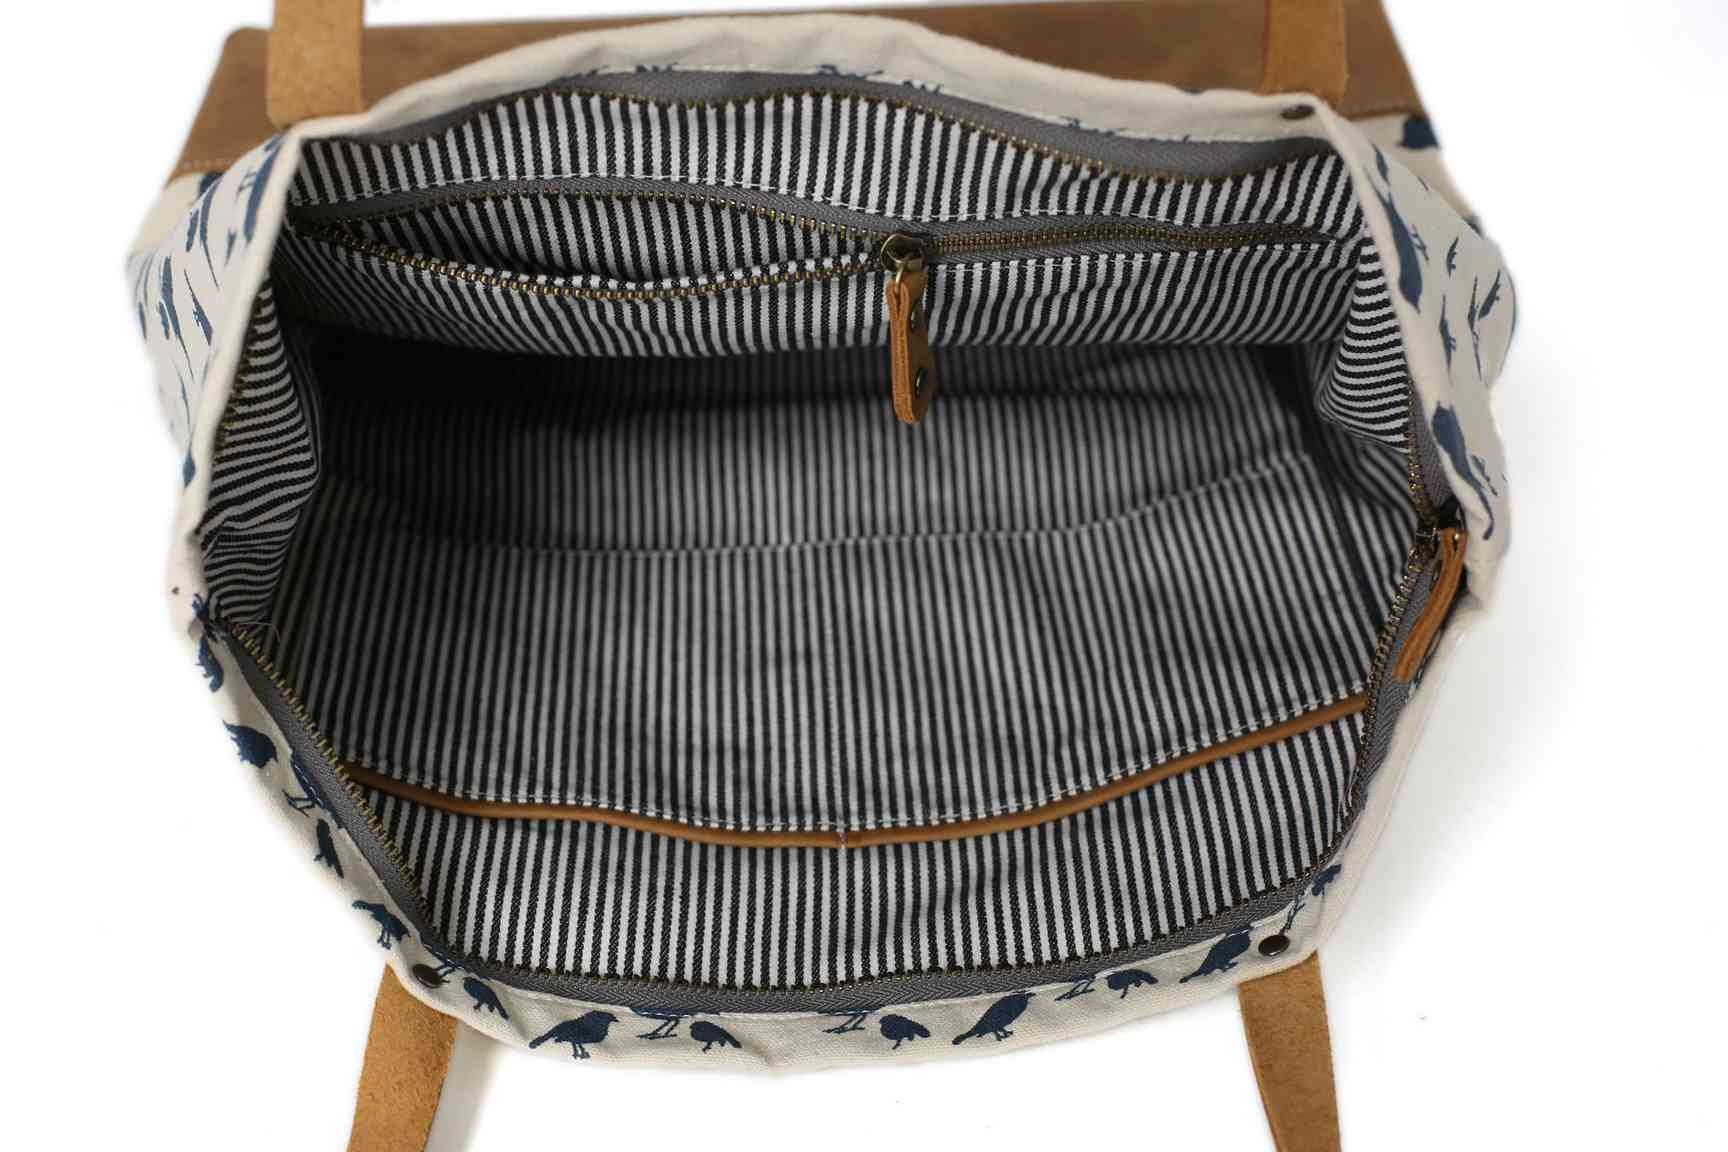 57781443bb2e MoshiLeatherBag - Handmade Leather Bag Manufacturer — Handmade ...